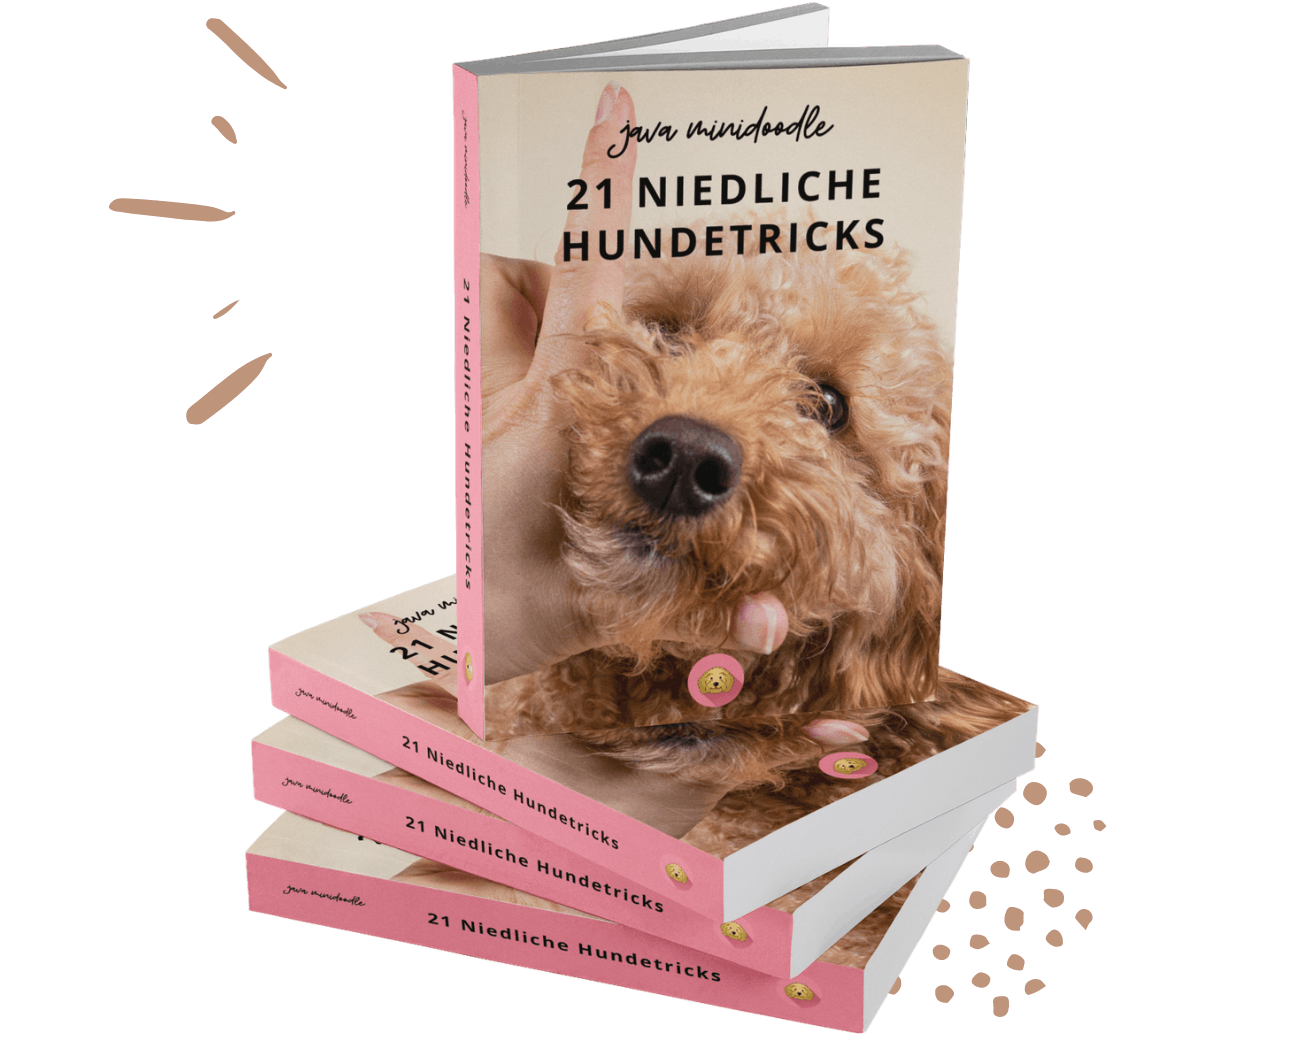 E-Book Hundetricks lernen mit Java Minidoodle